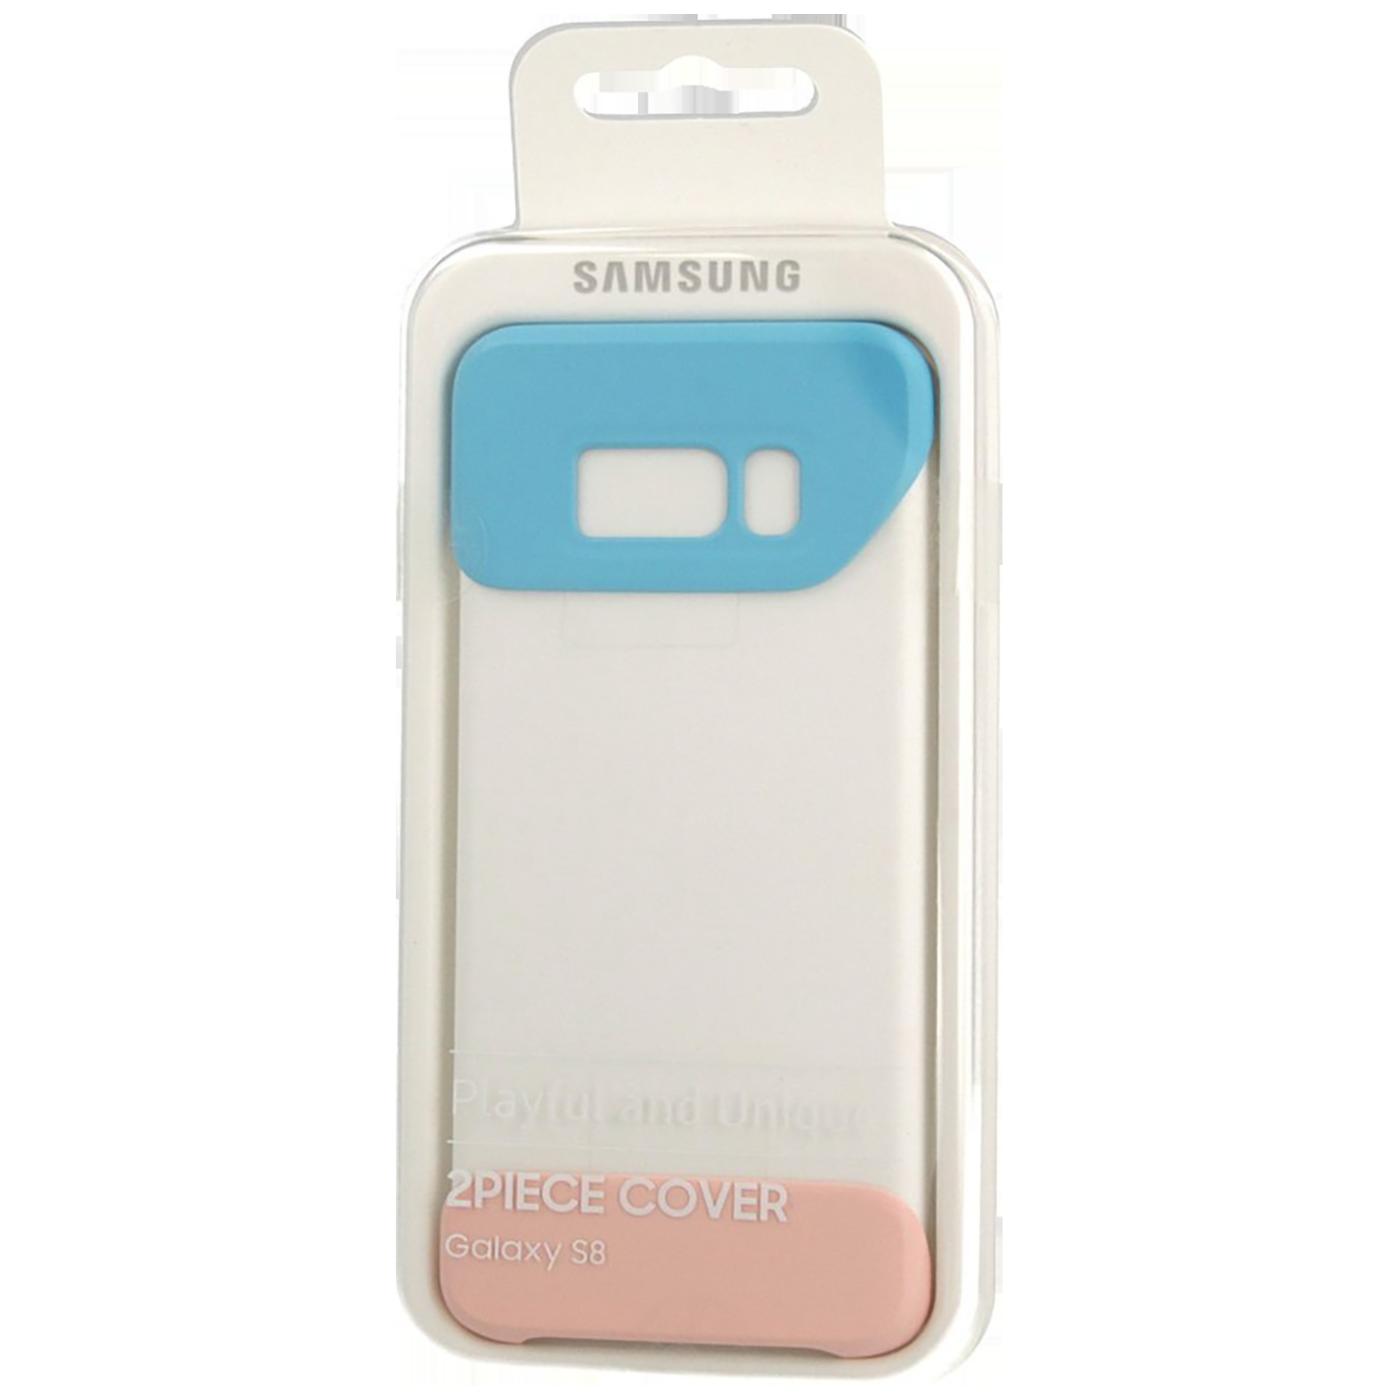 Silikonska futrola za Galaxy S8, plavo/breskva